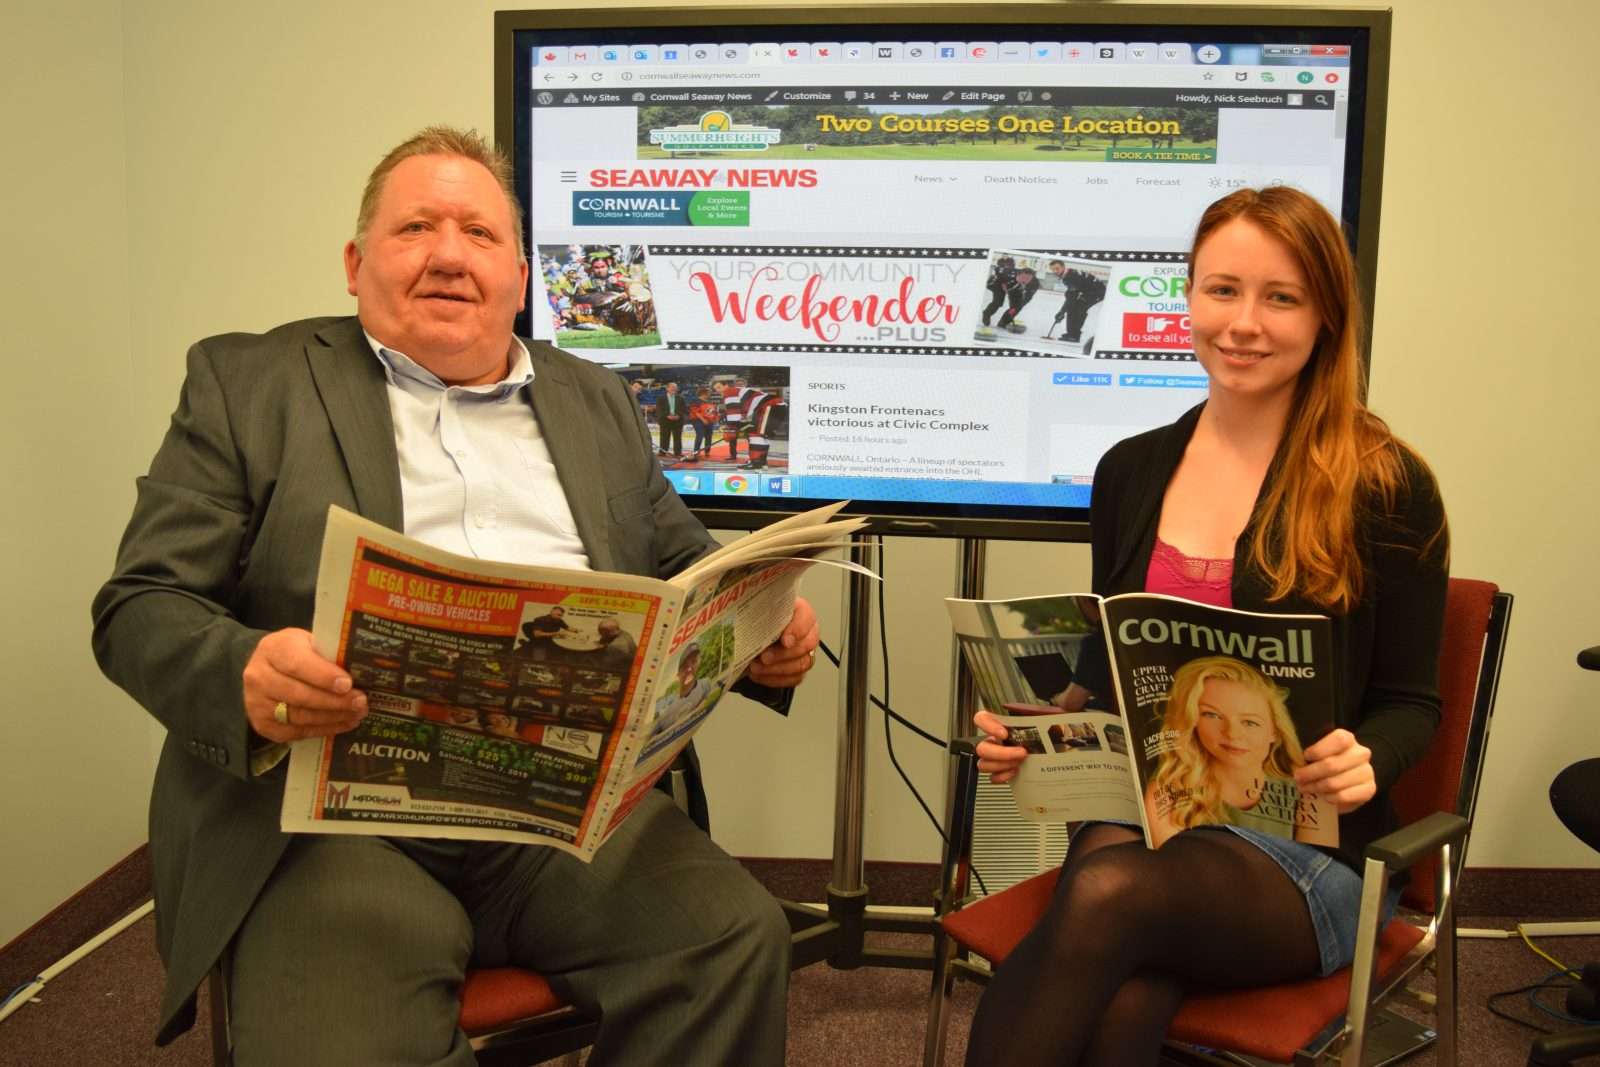 Seaway News celebrates 34 years